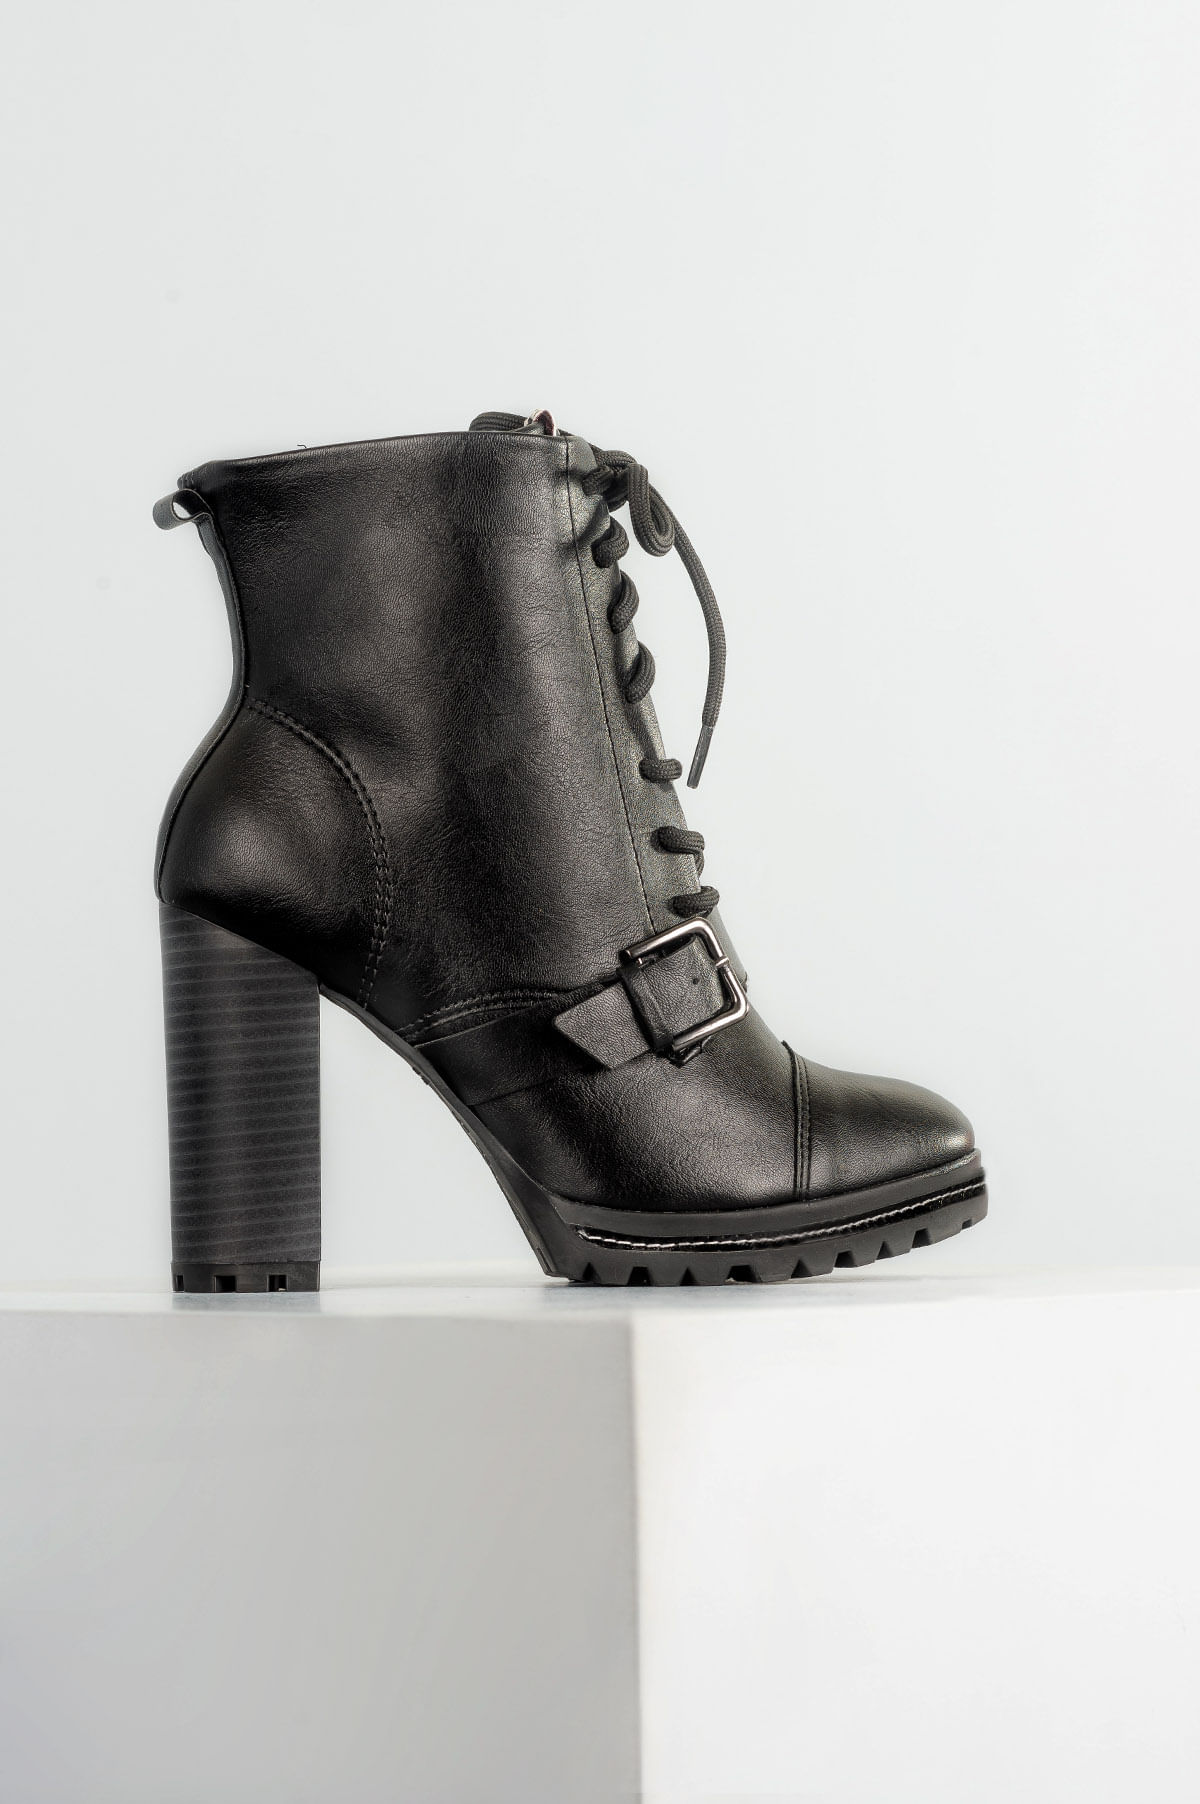 4dddc41ad Bota Feminina Coturno Elyse Ramarim SINT - PRETO - Mundial Calçados